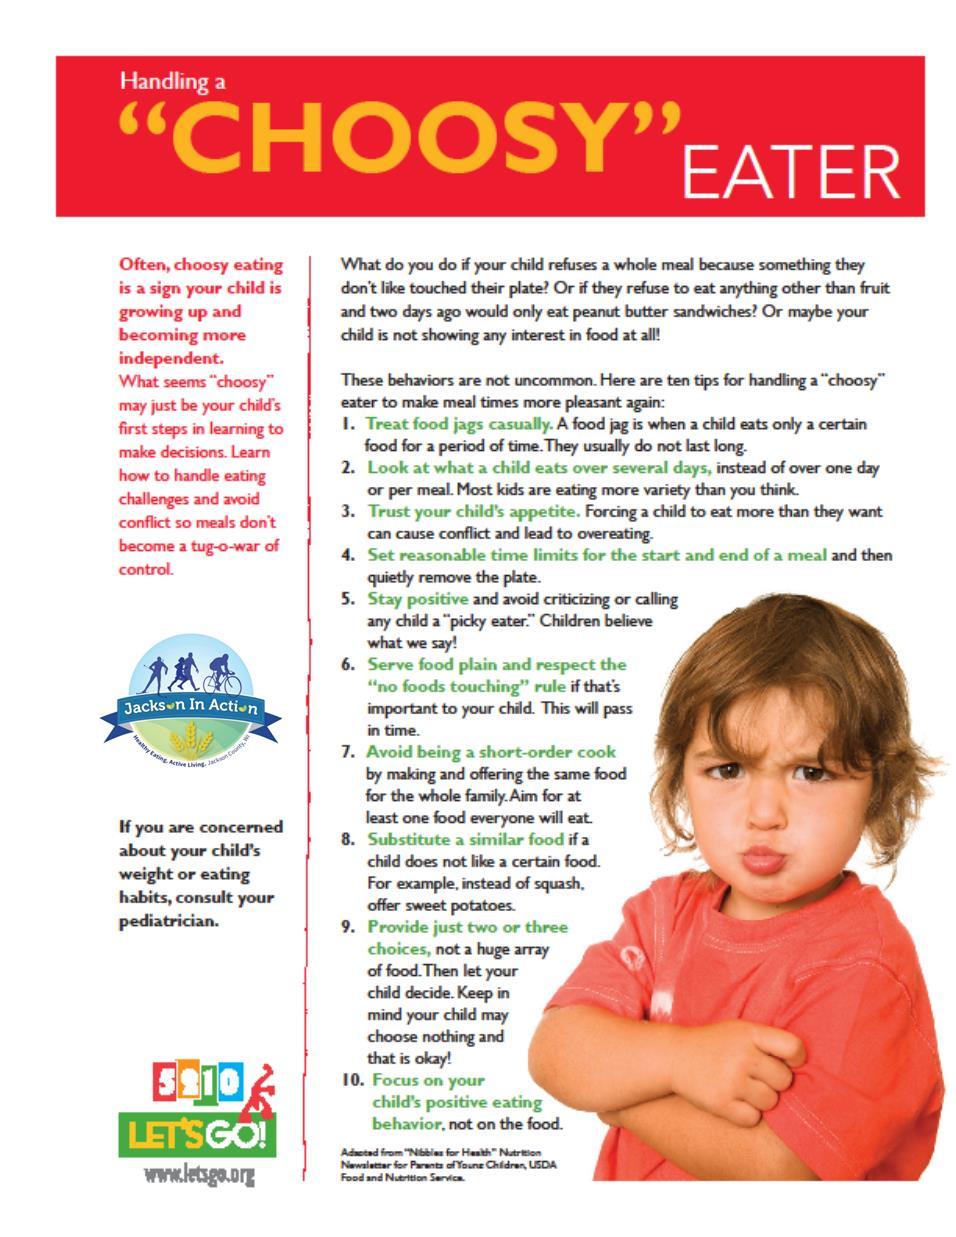 Handling a Choosy Eater.jpg